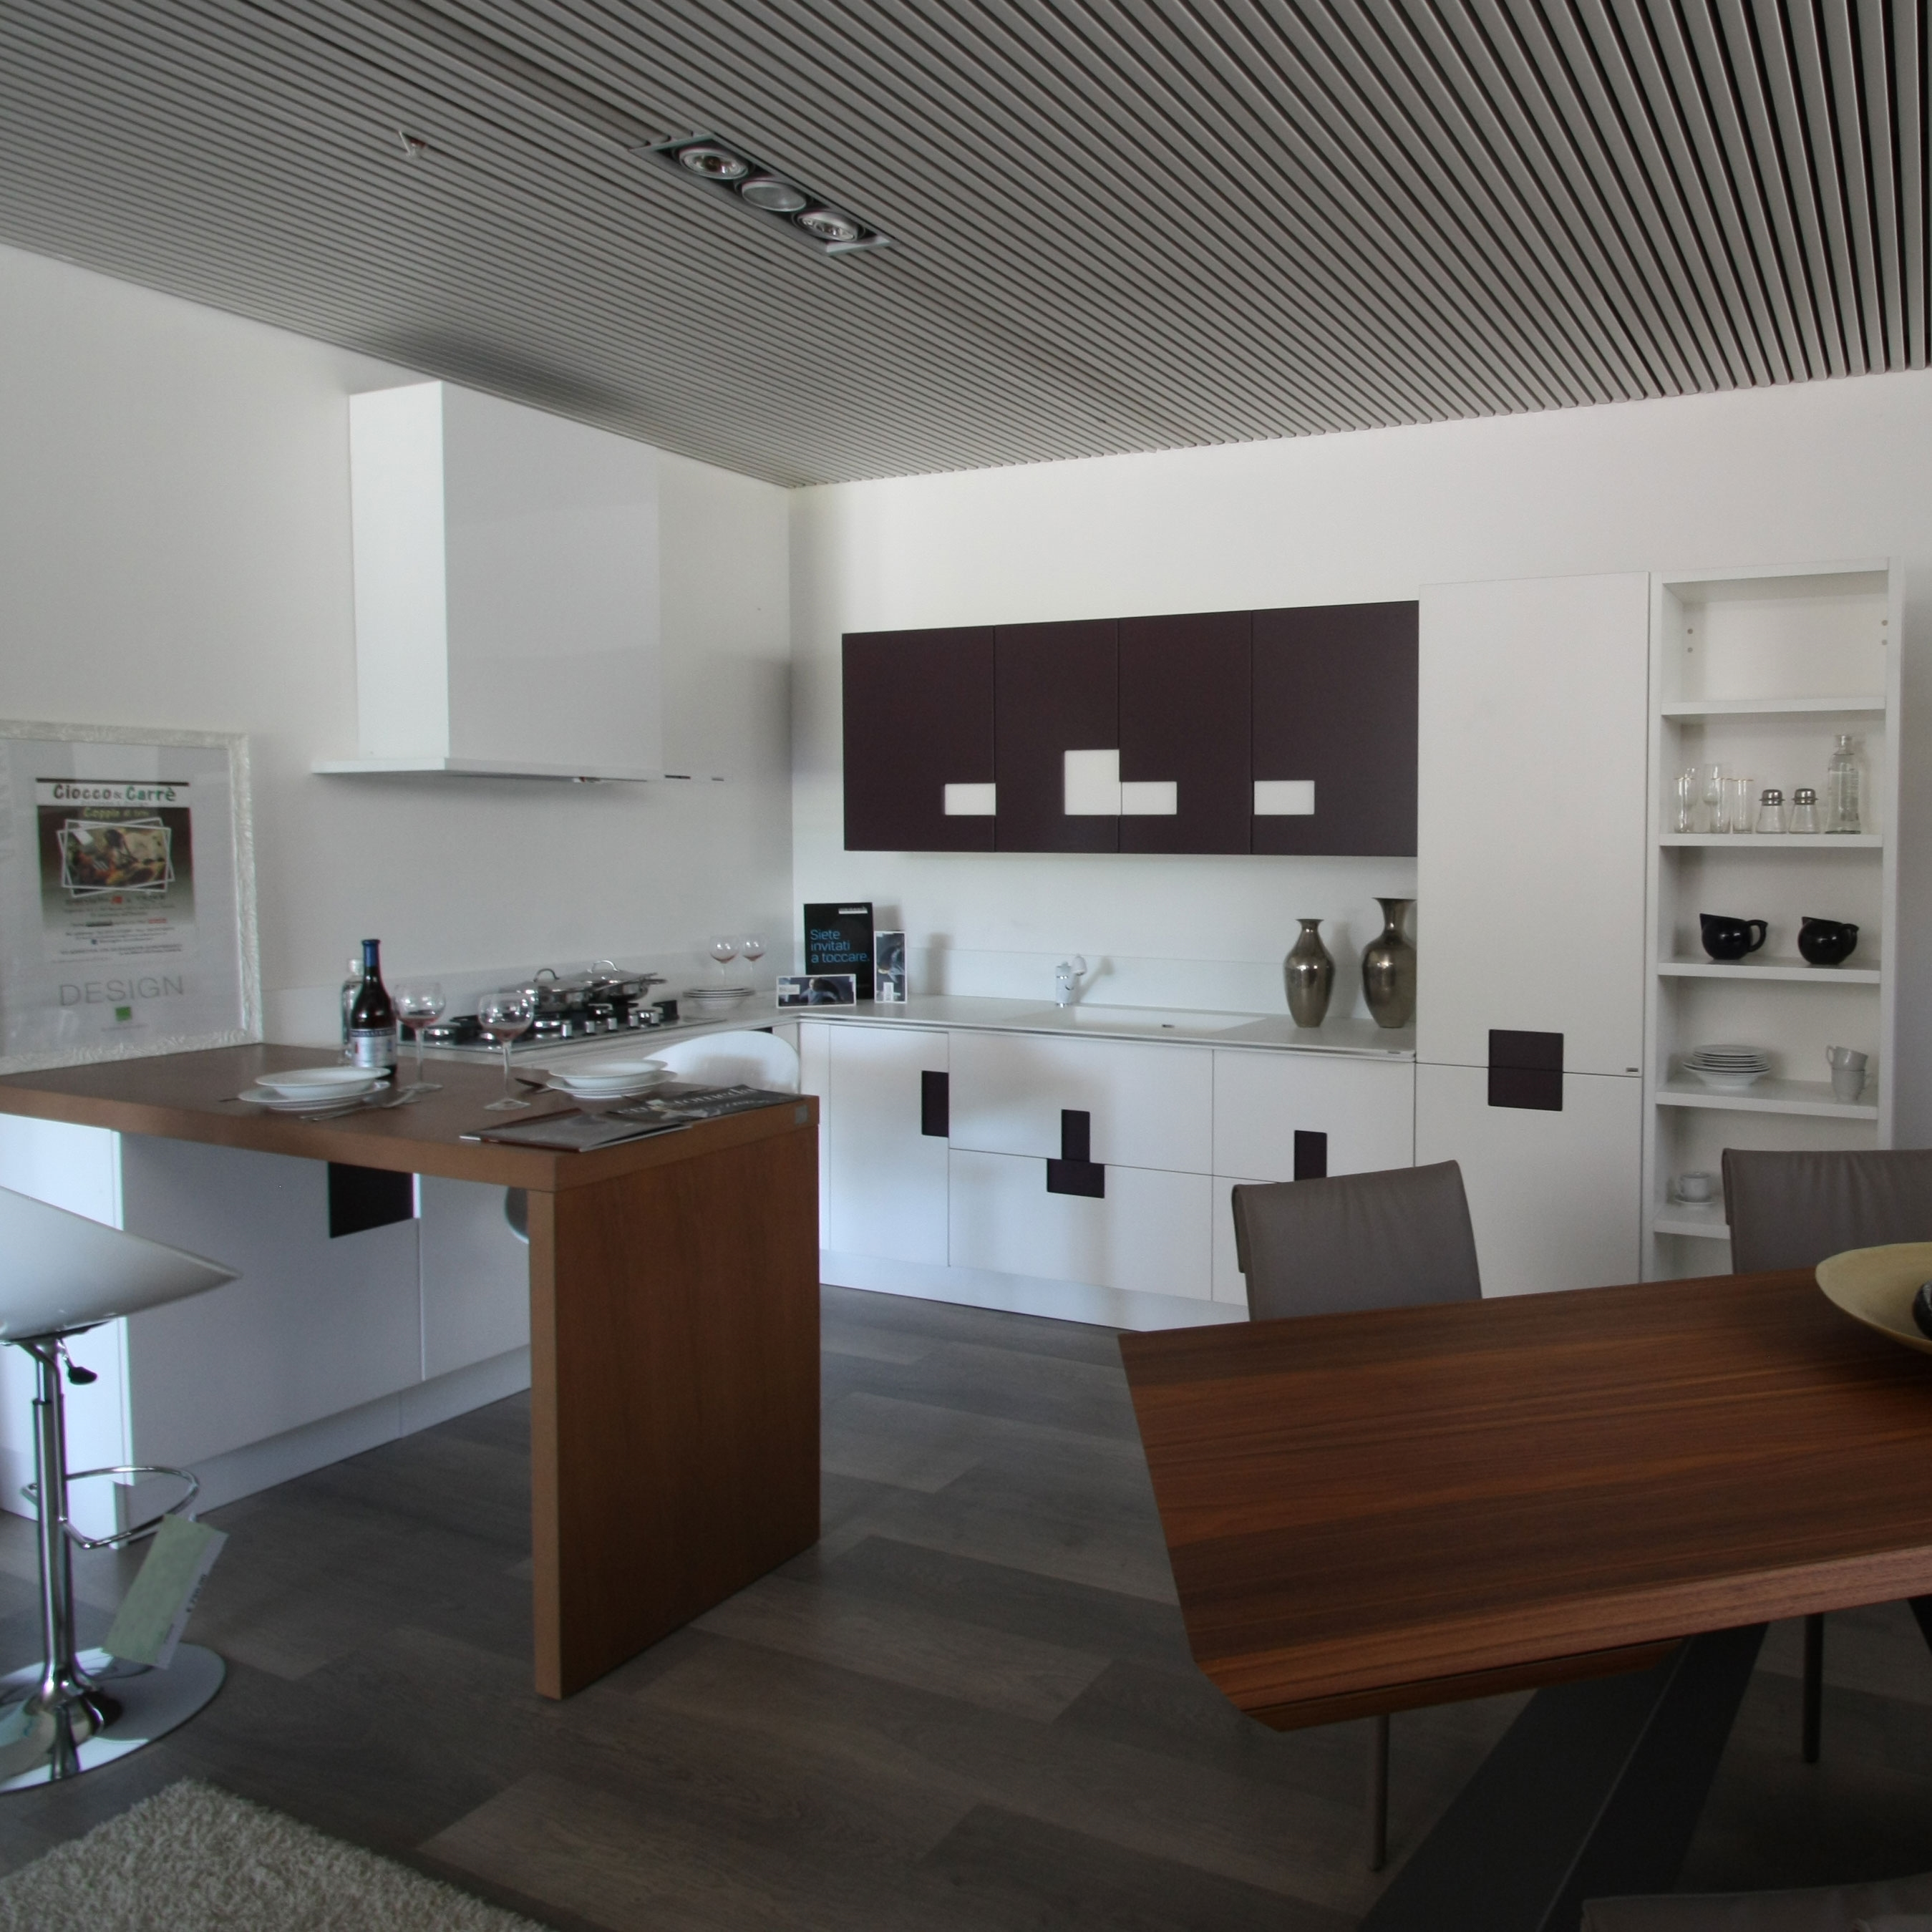 Beautiful cucine esposizione offerta images for Cucine esposizione outlet